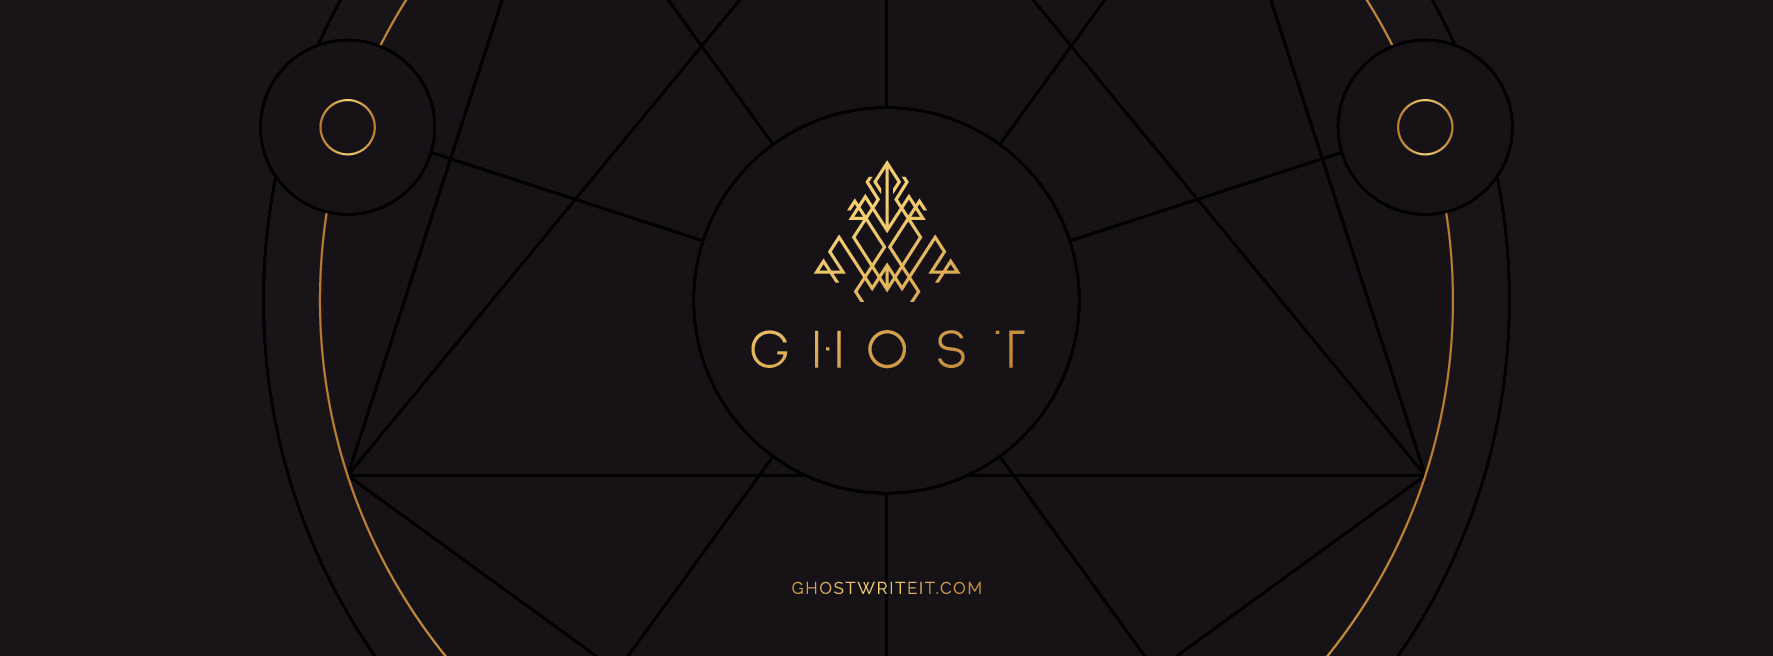 Ghost Facebook Cover Fin-01.jpg